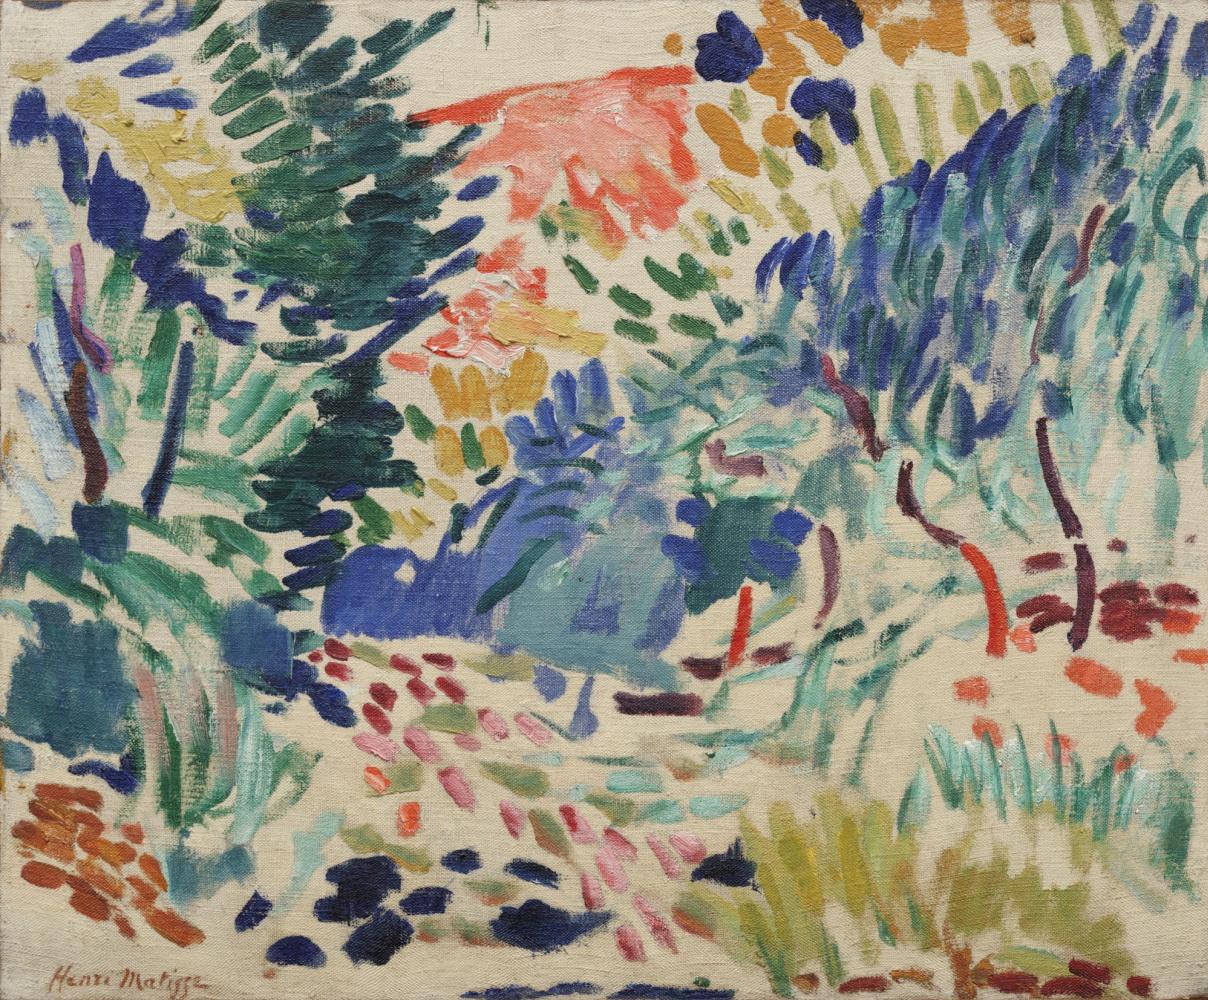 Henri Matisse. Landscape at Collioure